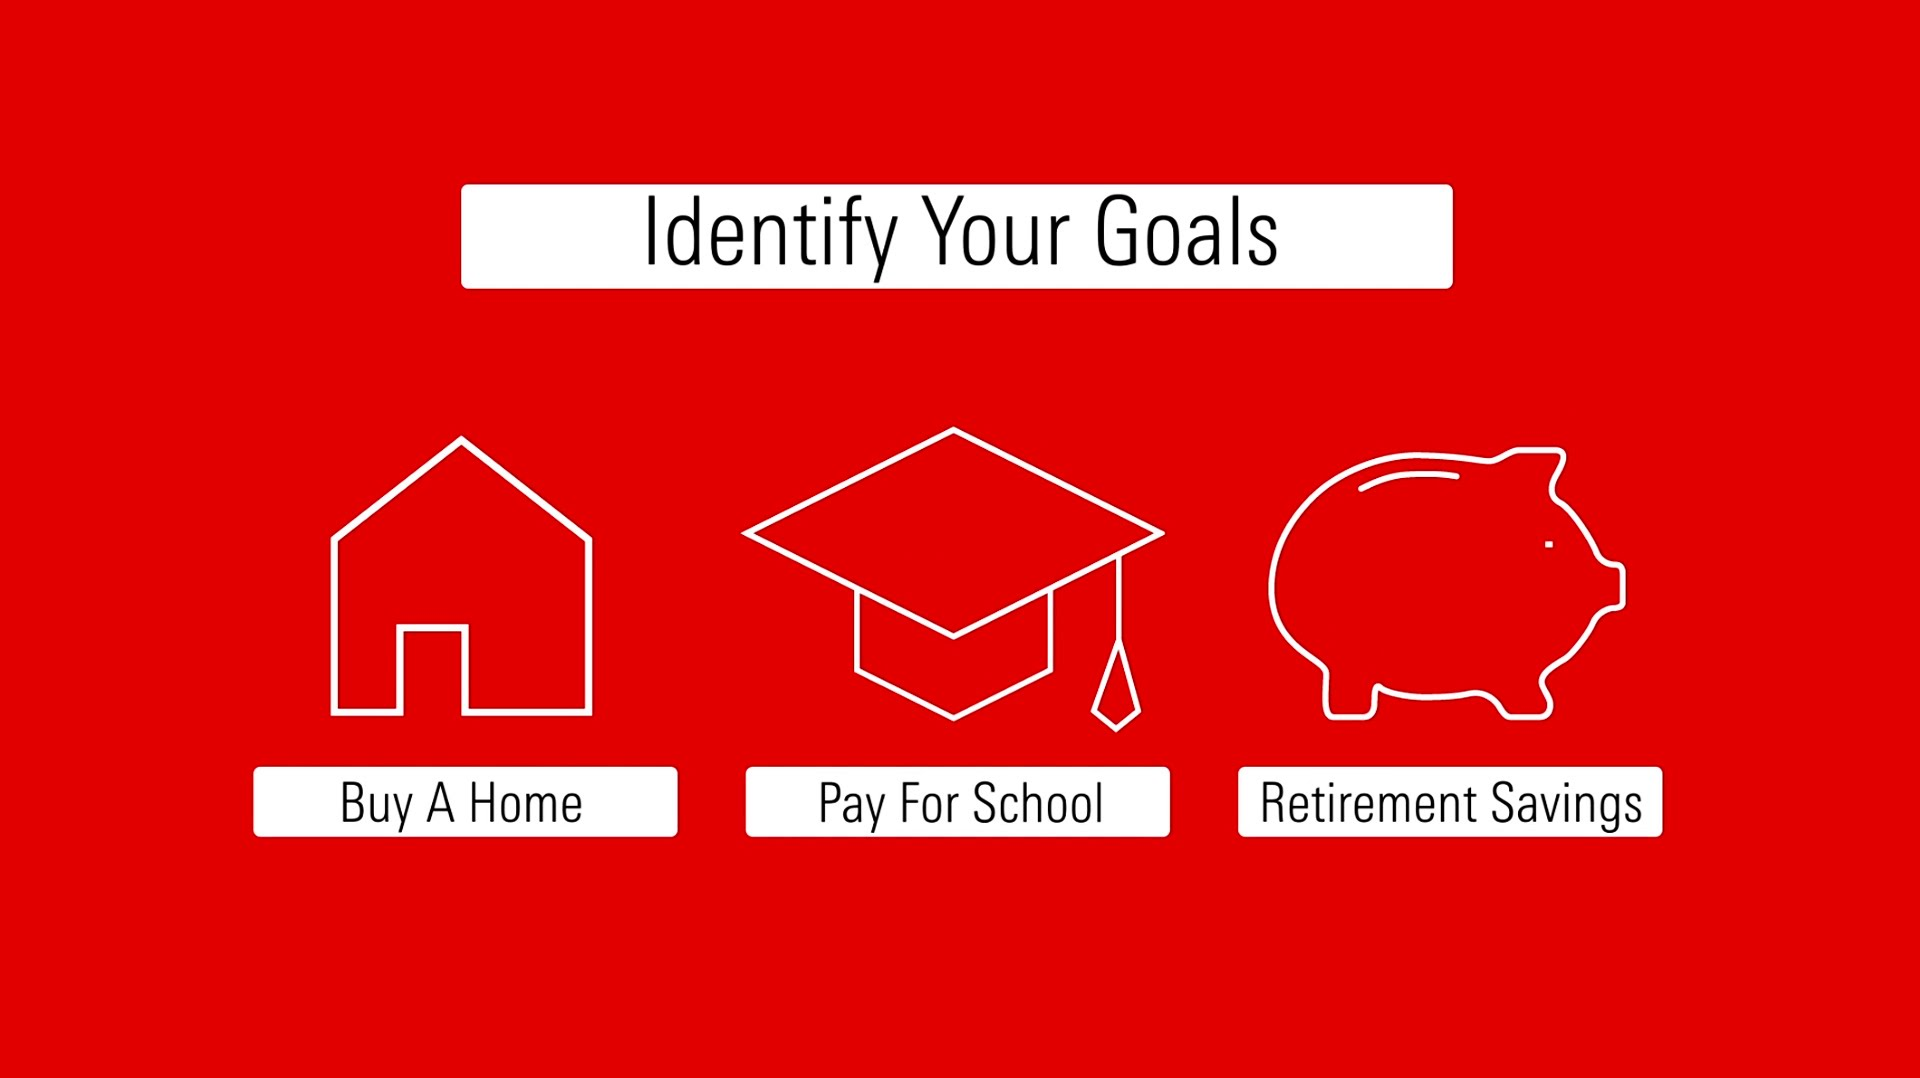 「【新手投資指南】每月一點點,小資族也有致富的一天」- How to Start Investing for the First Time